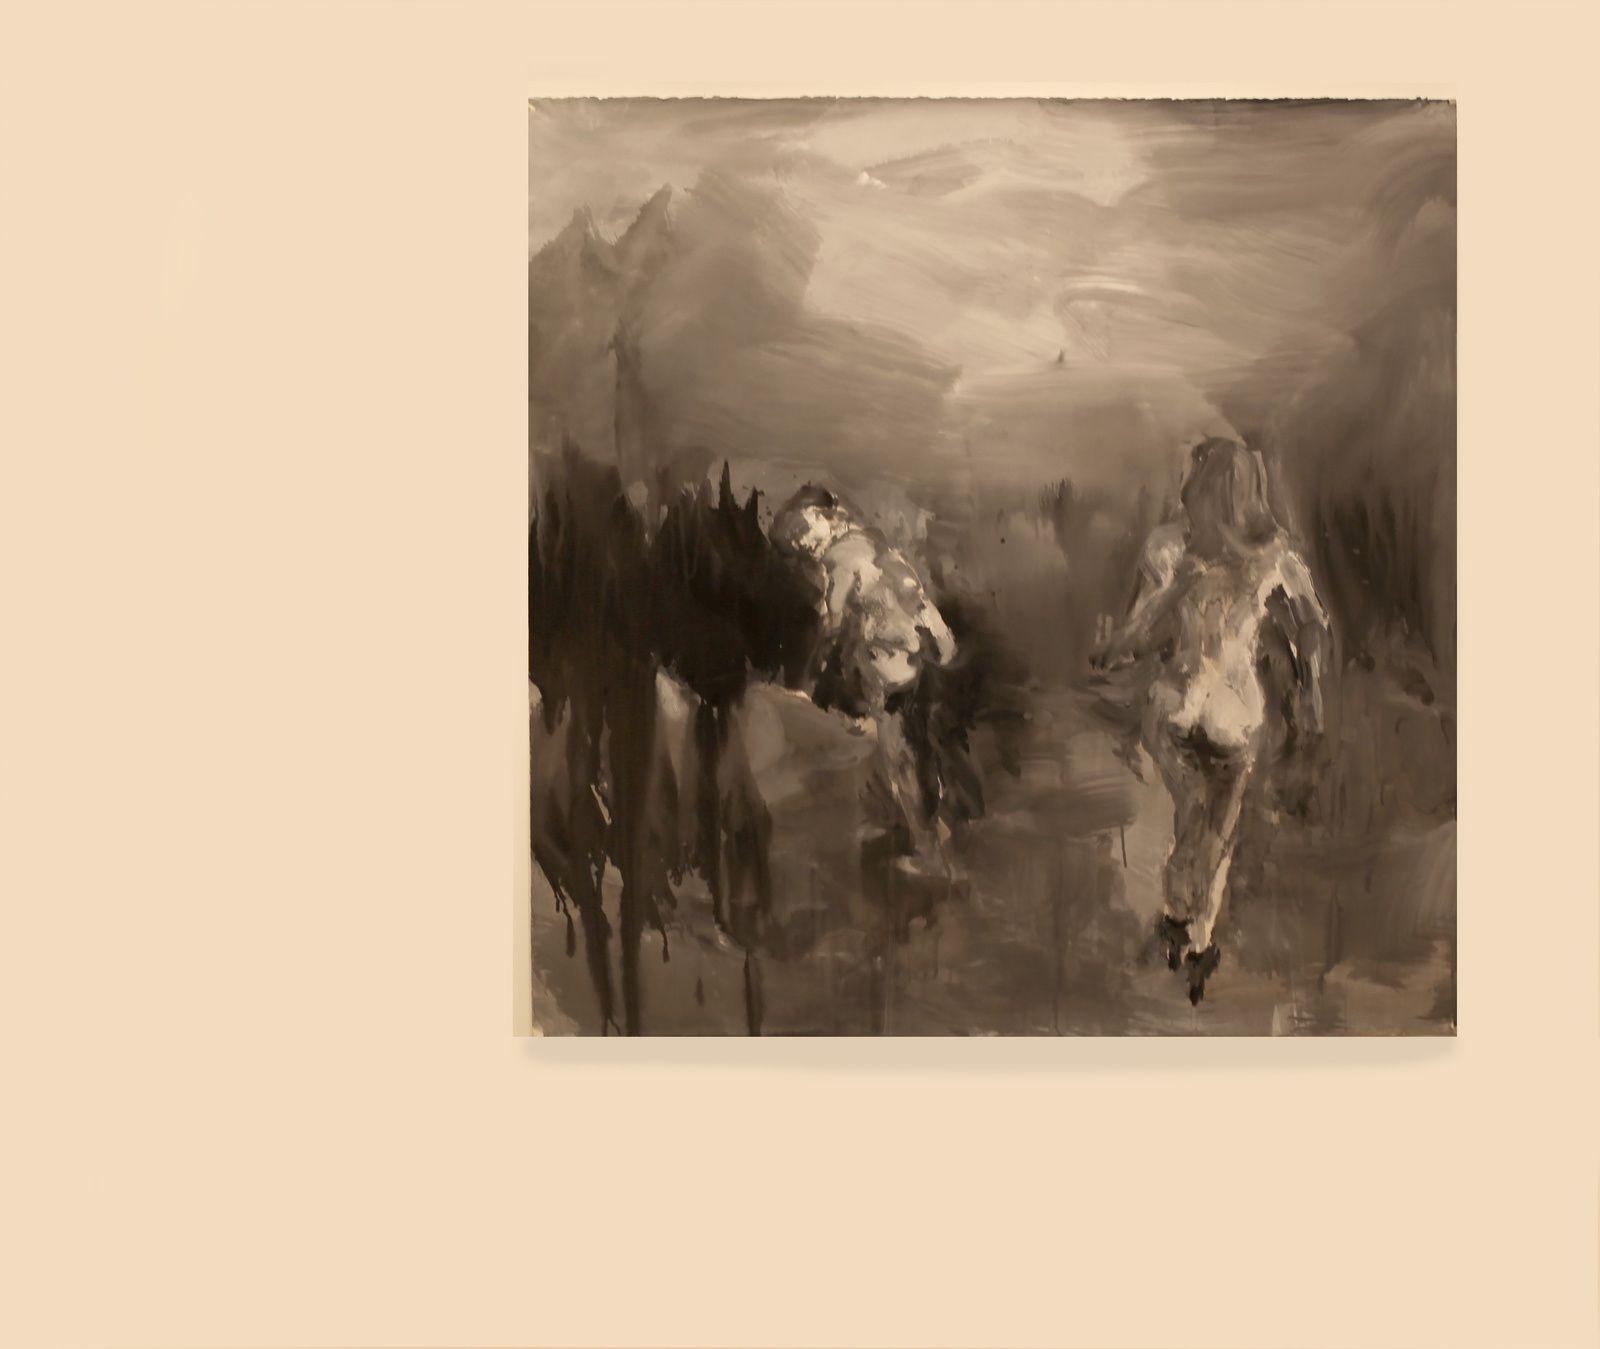 """Mesdemoiselles H. et V."", 2016 de Yan PEI-MING - Courtesy Galerie Thaddaeus ROPAC © Photo Éric Simon"